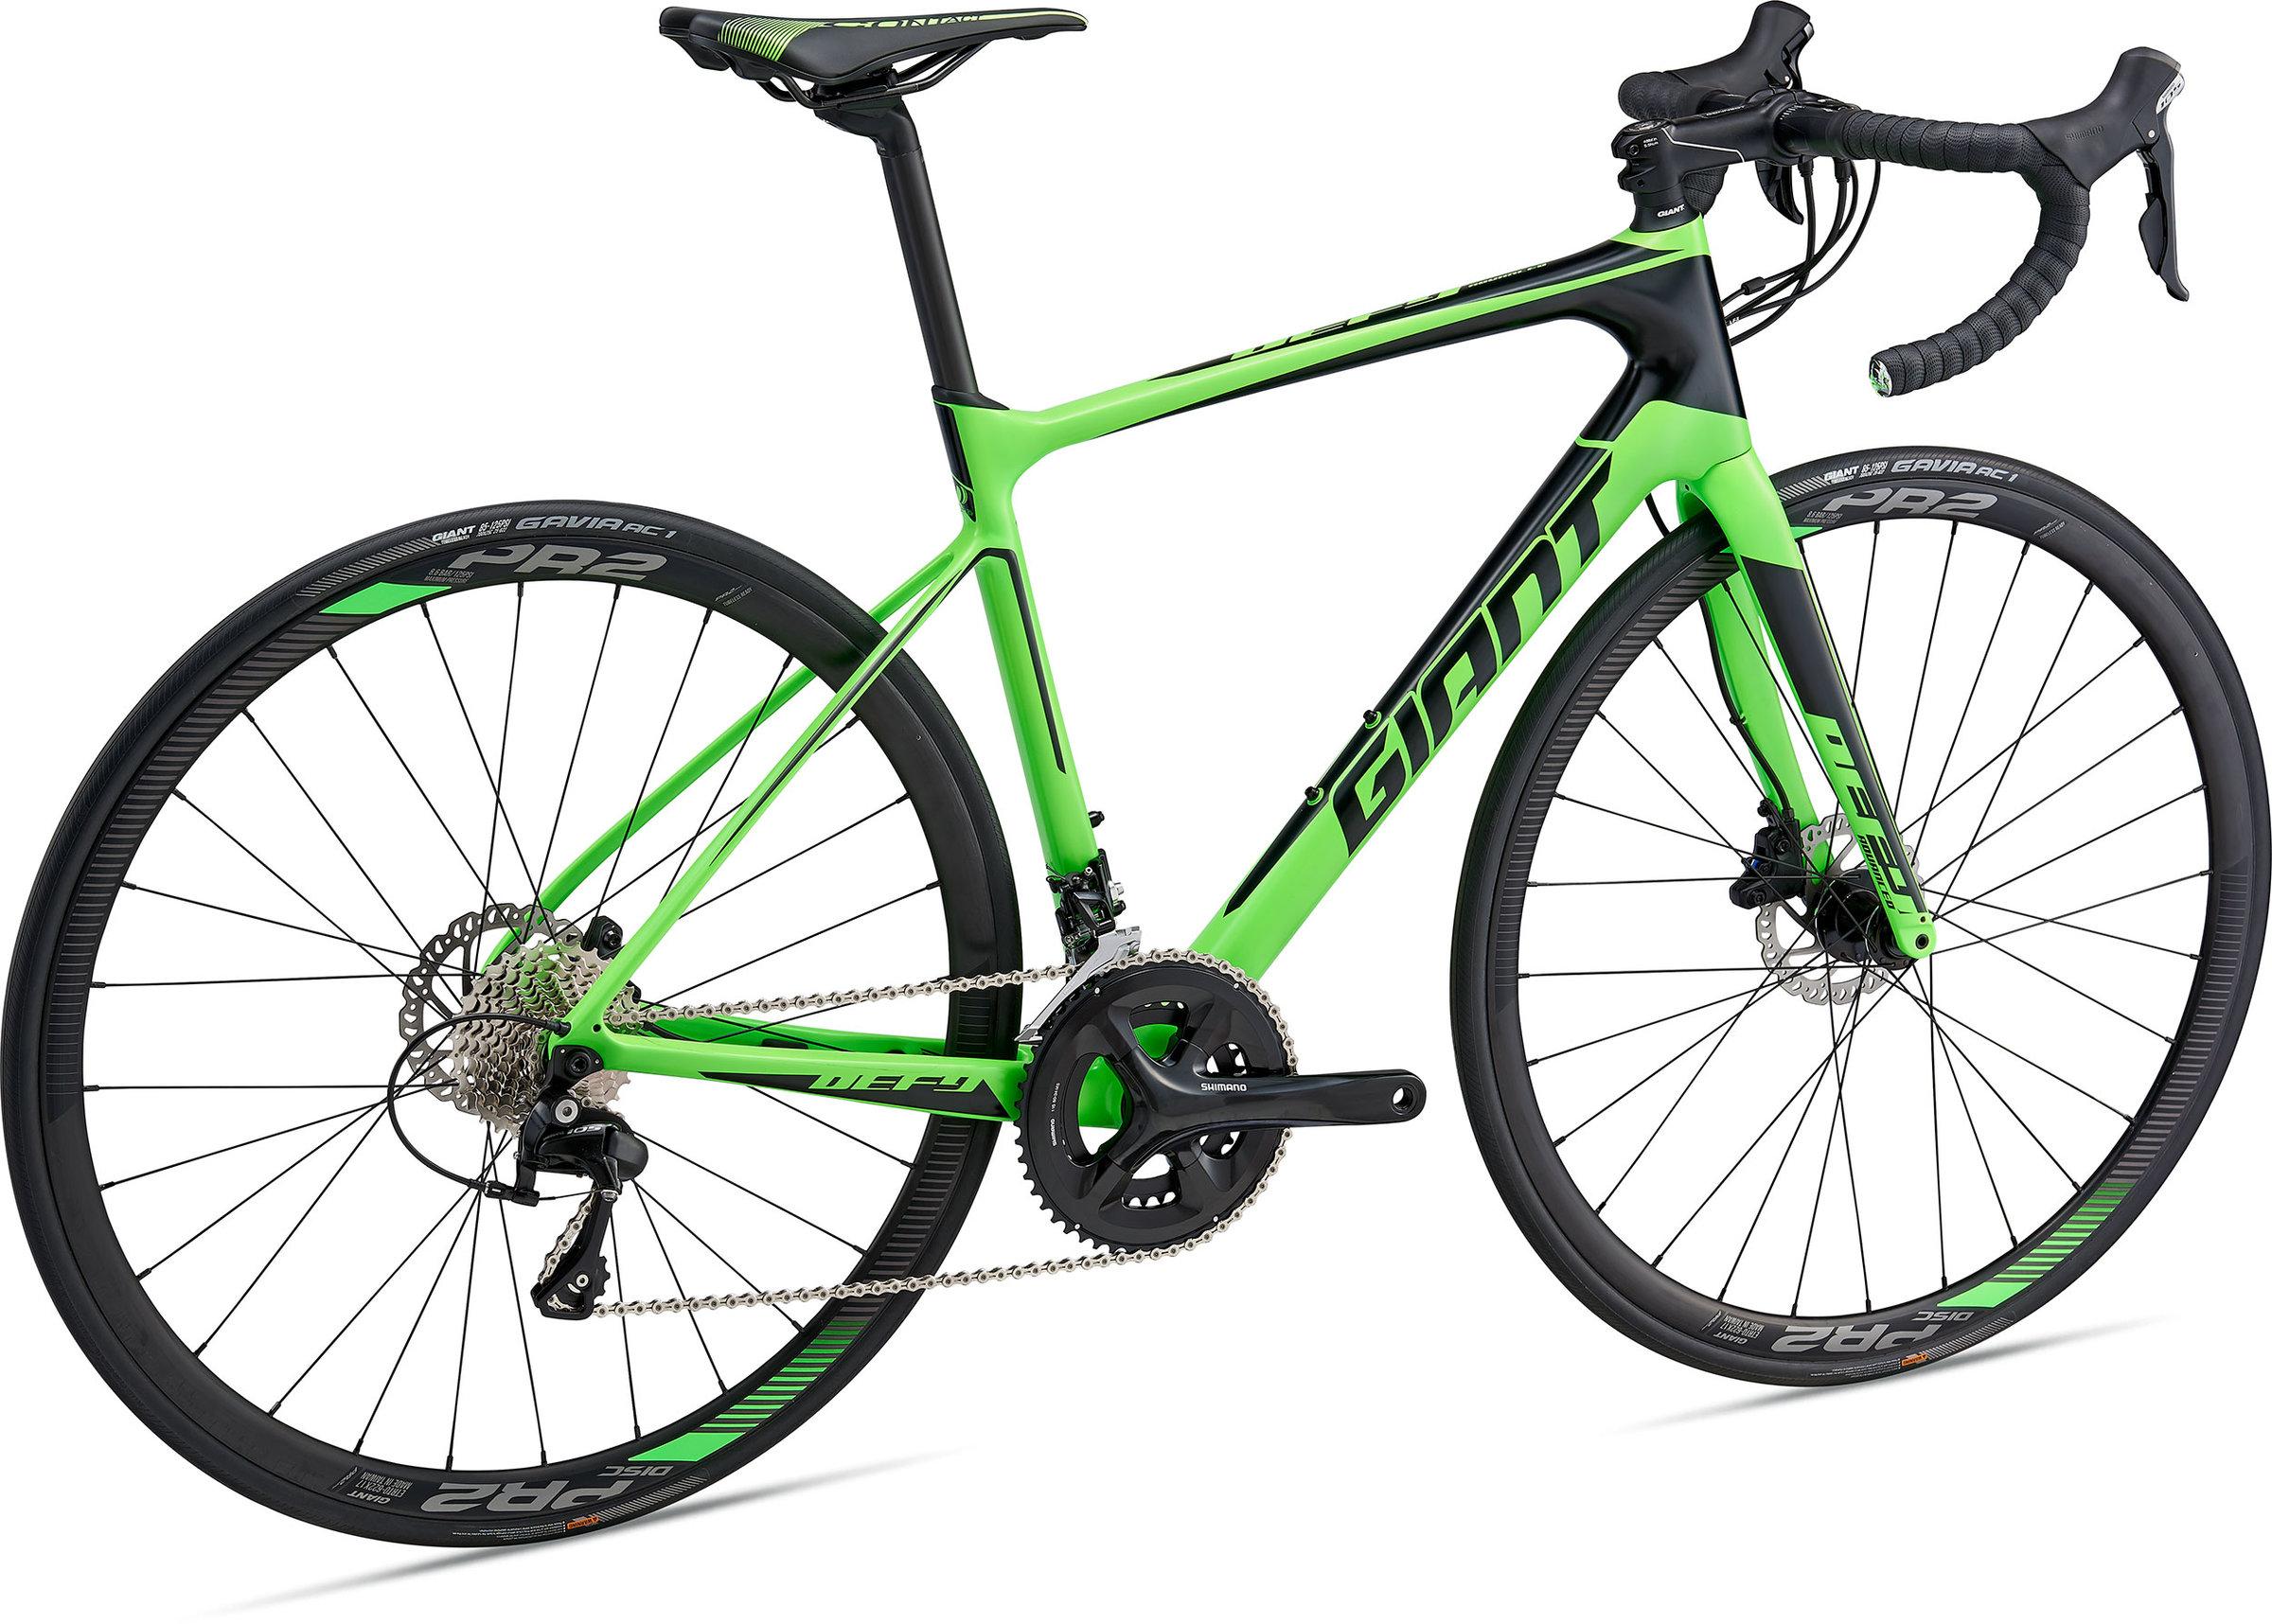 Giant Defy Advanced 2 - Harris Cyclery bicycle shop - West Newton